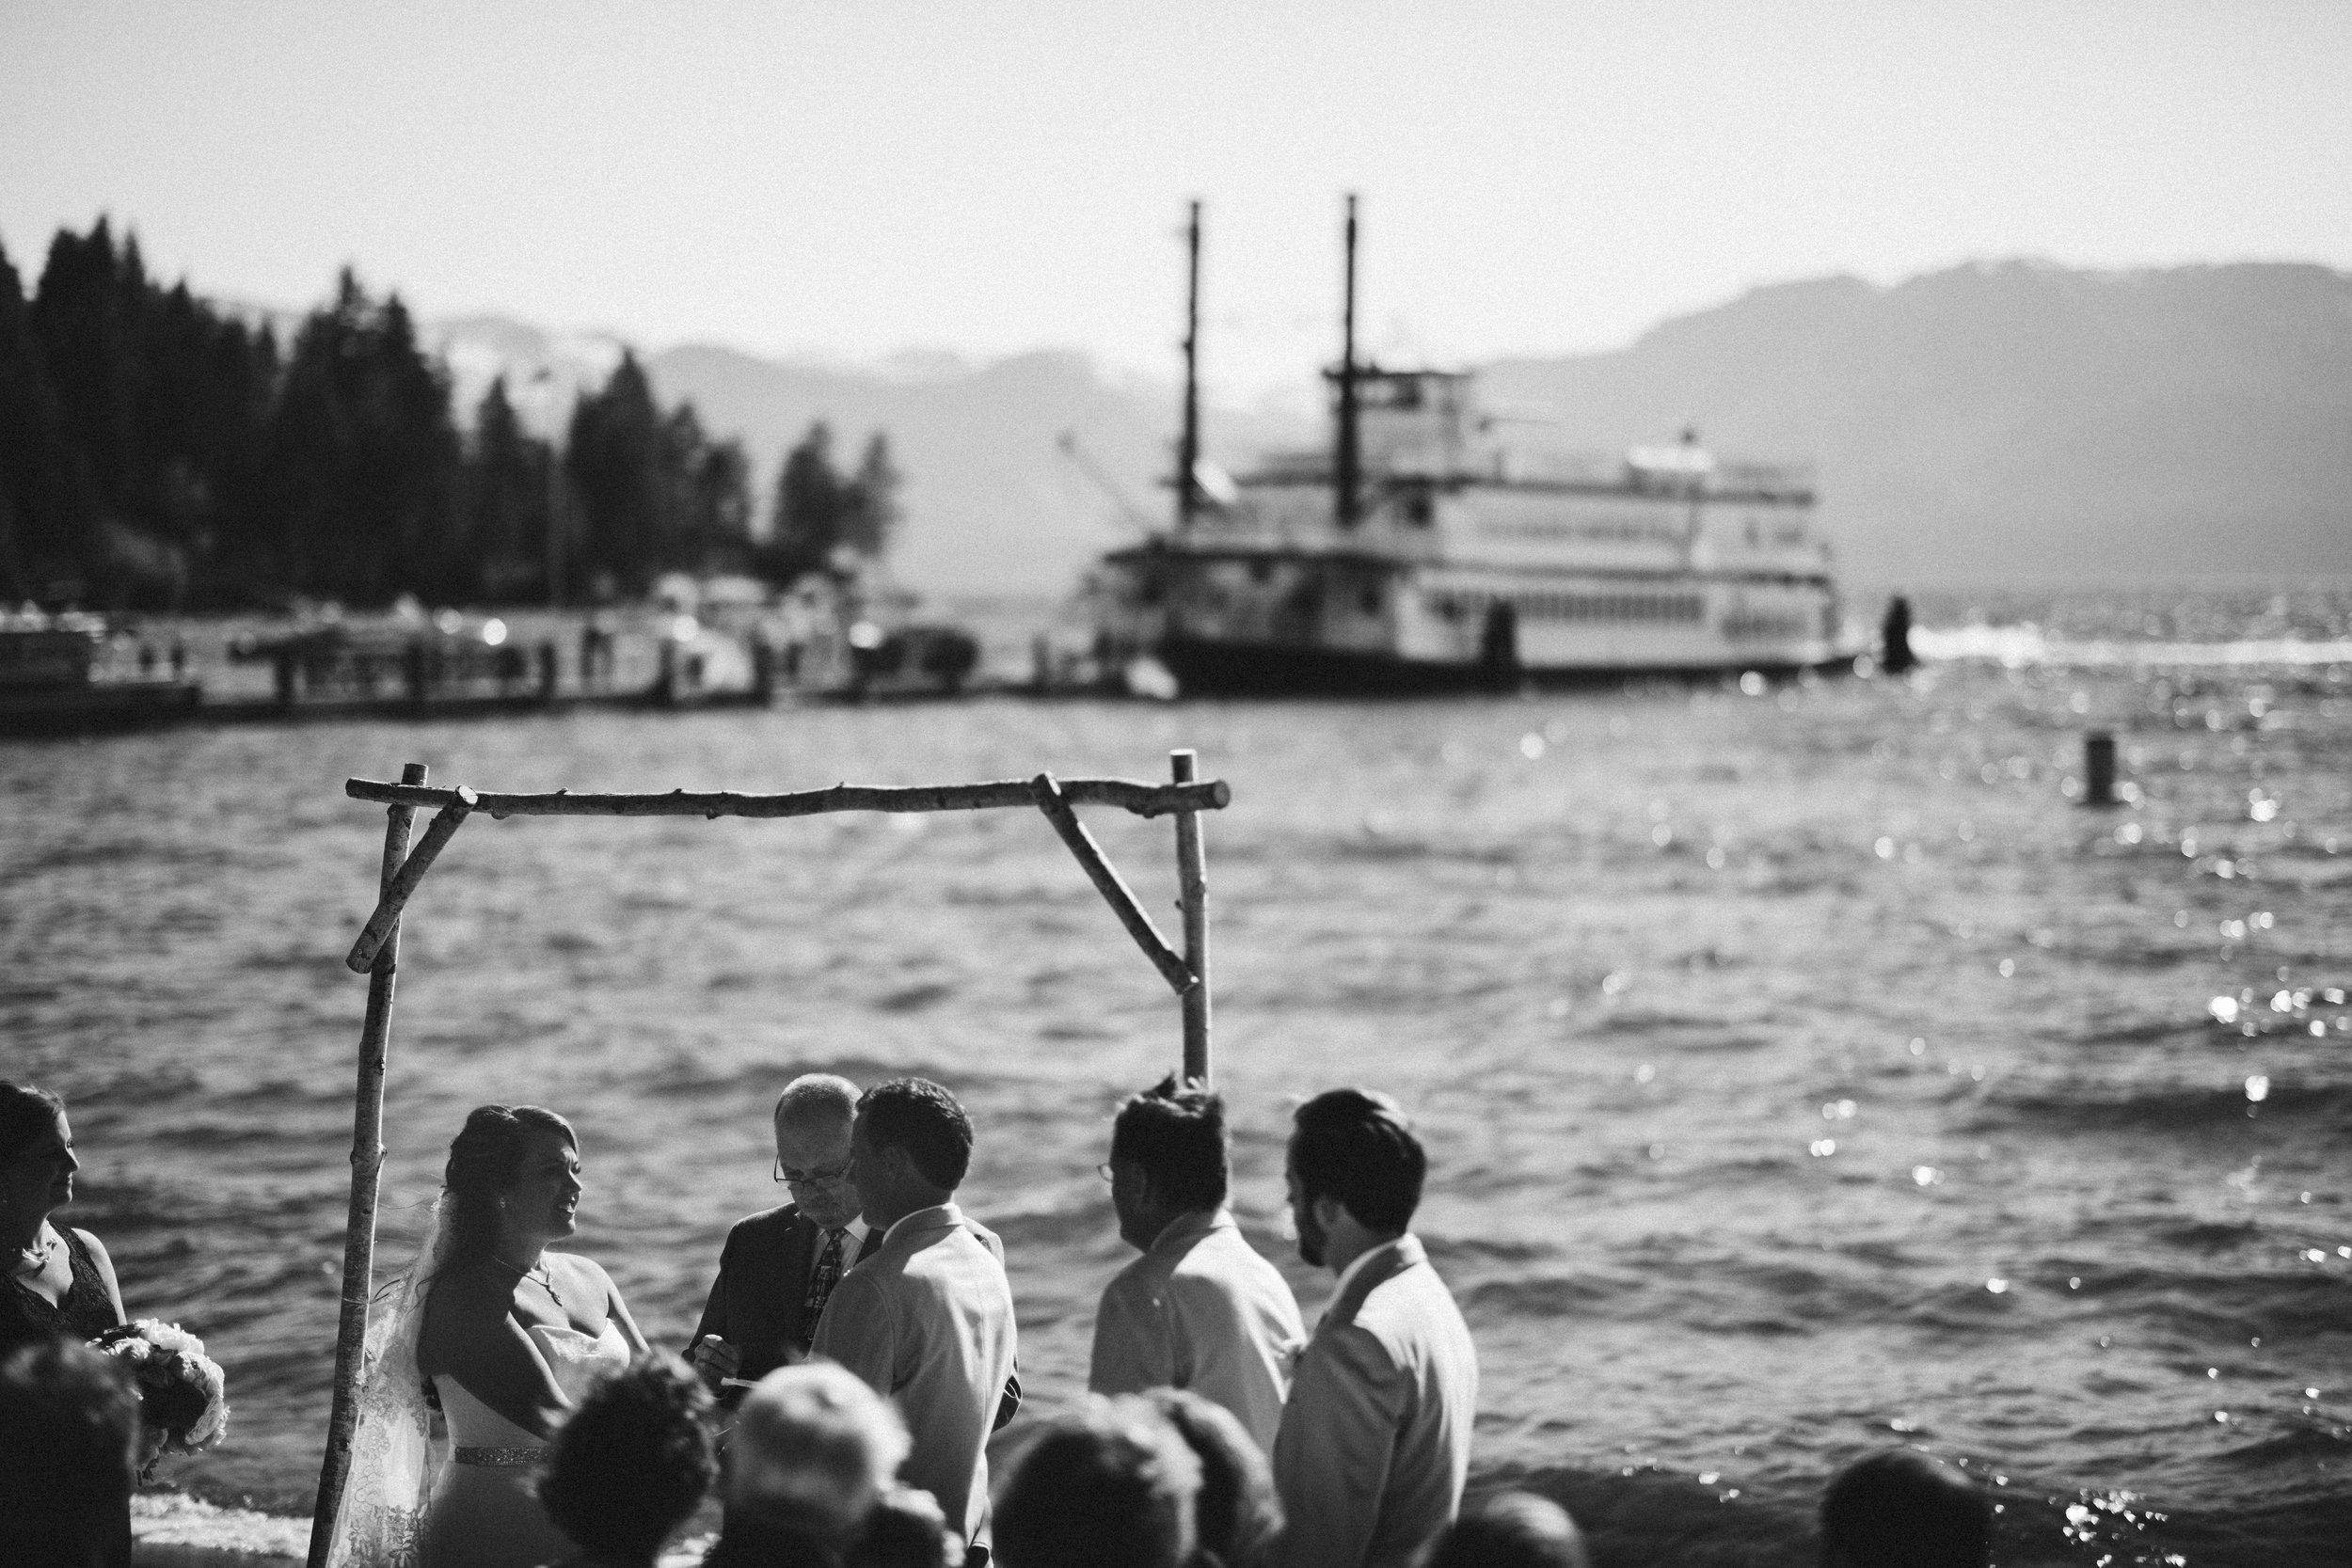 _P8A2412vildphotography-adventurewedding-tahoe-laketahoewedding-laketahoeweddingphotographer-tahoewedding-jamie-ed.jpg